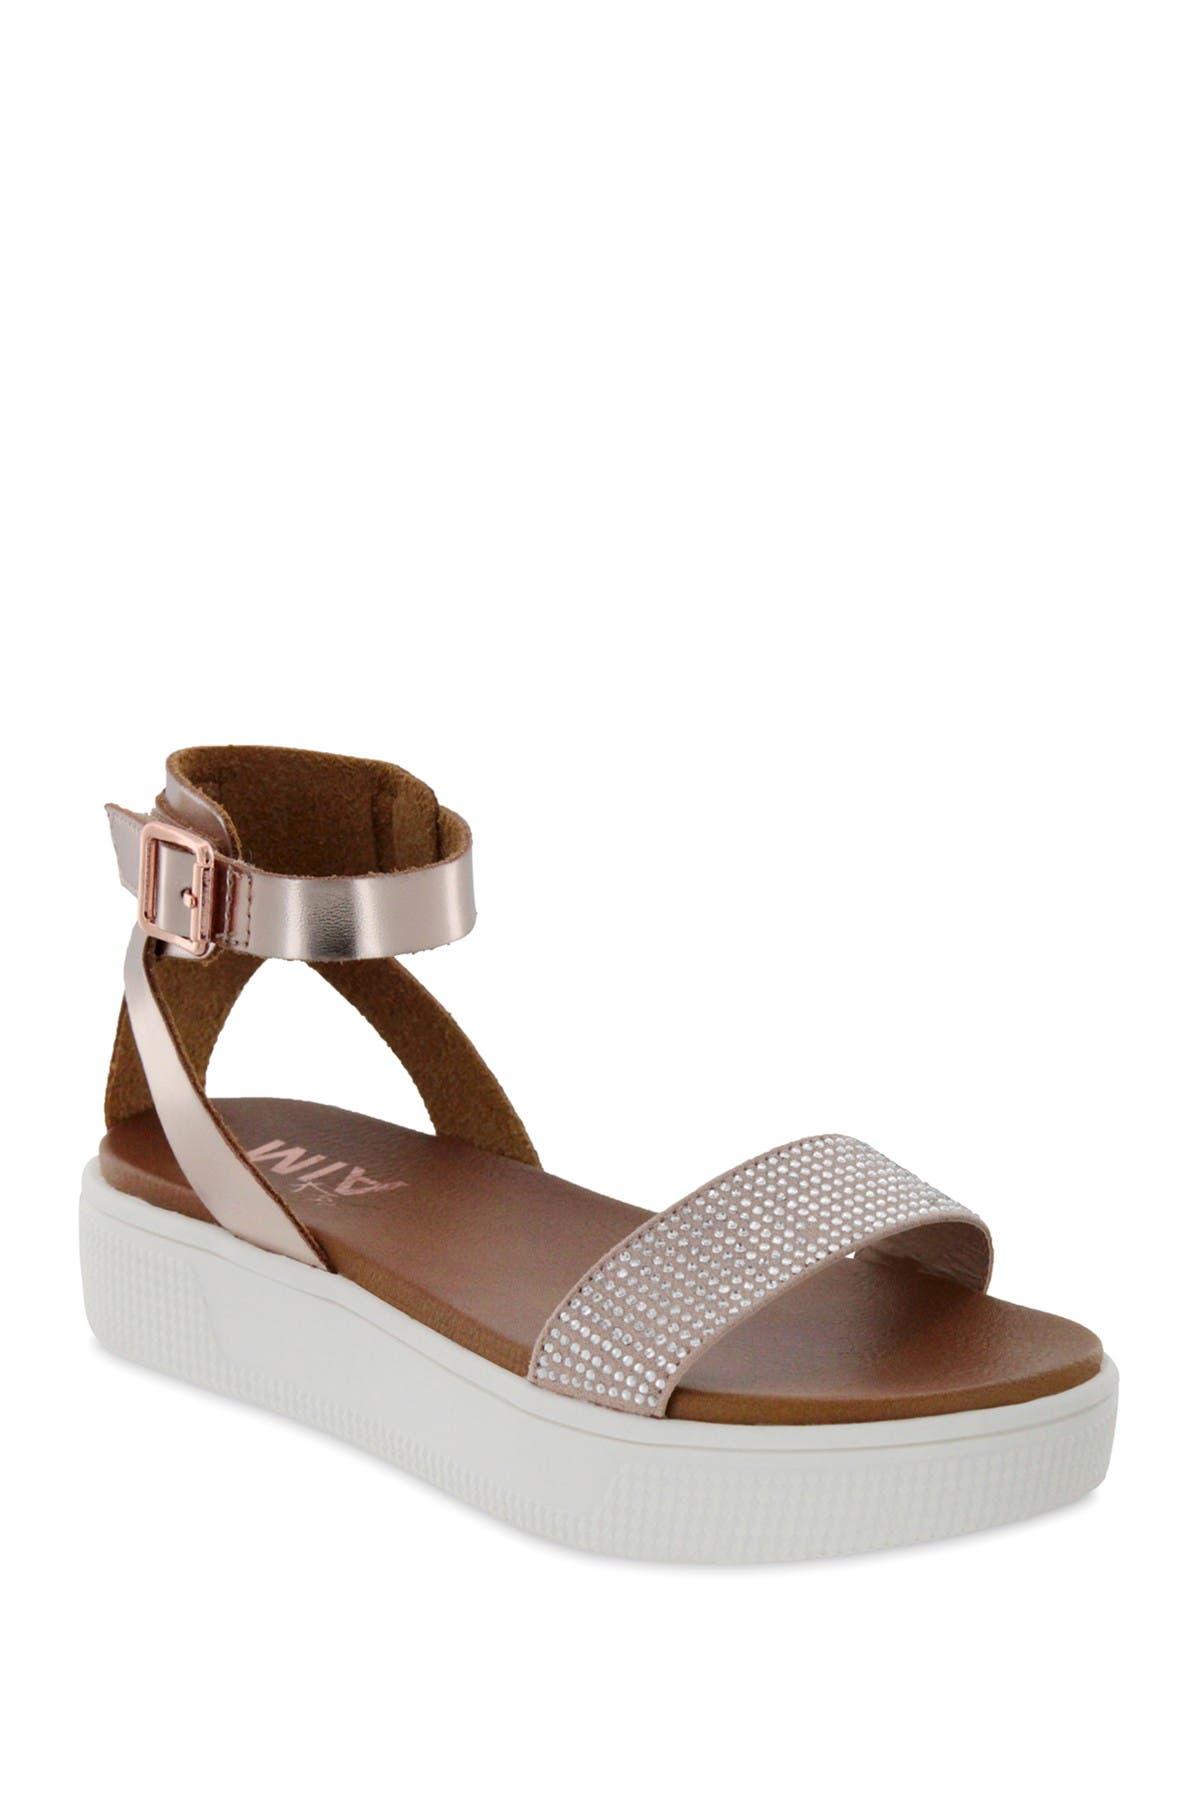 Image of MIA Little Ellen Ankle Strap Sandal